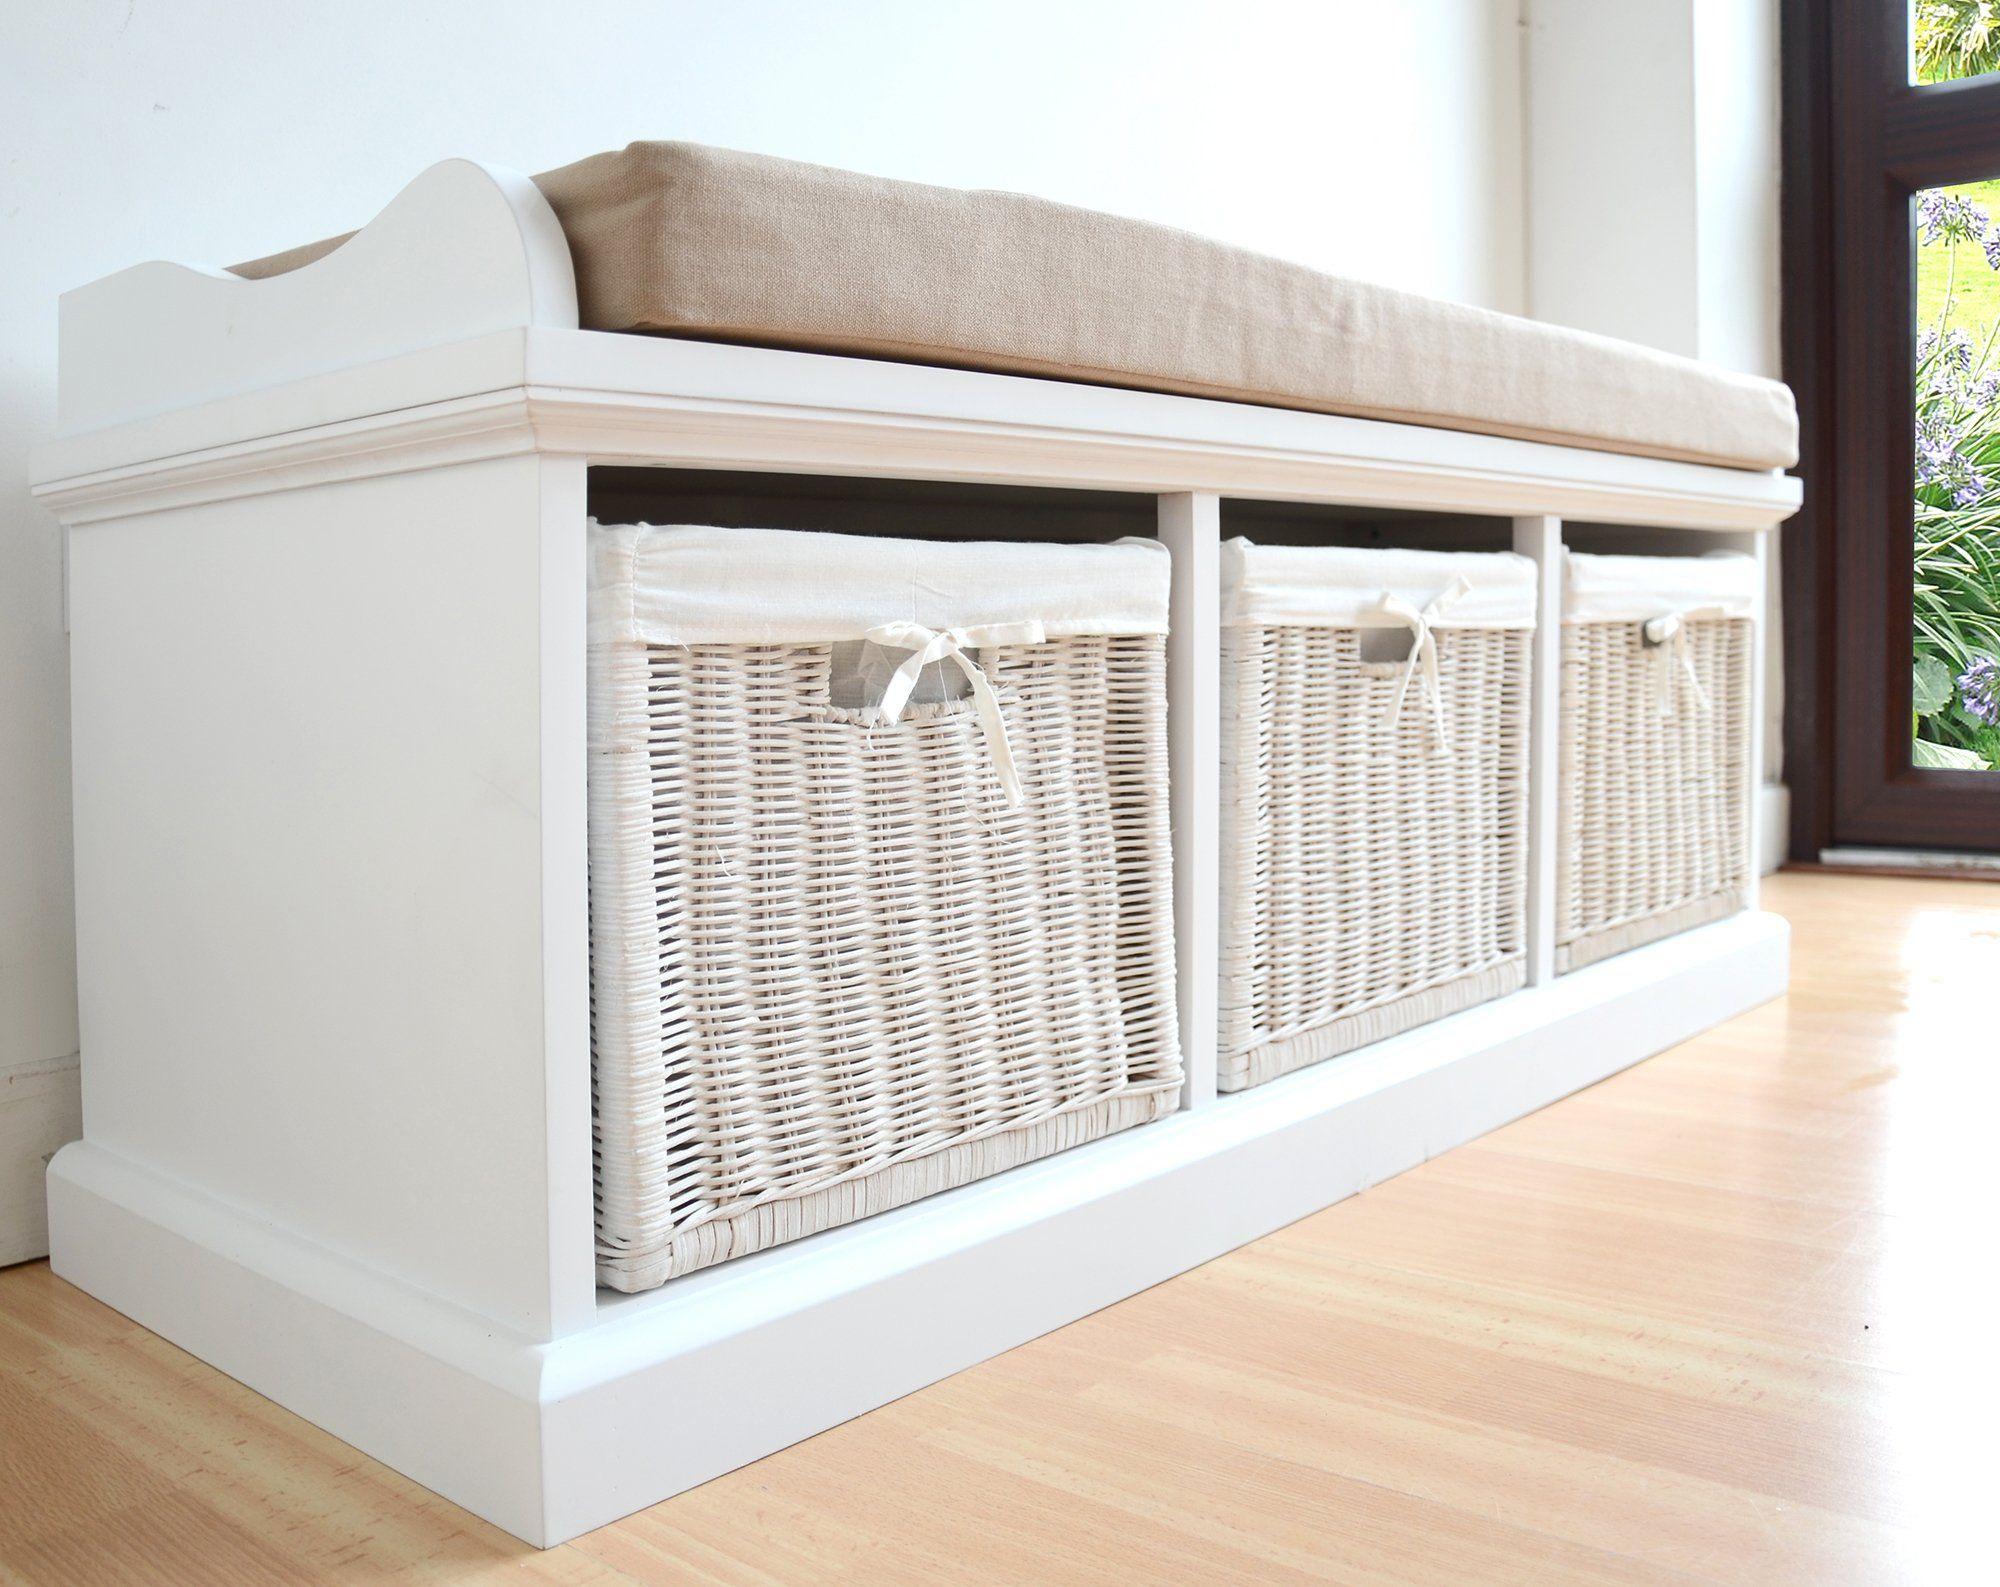 Tetbury White Storage Bench With Cushion Large Storage Bench With Cushion Storage Bench Bedroom Hallway Storage Bench